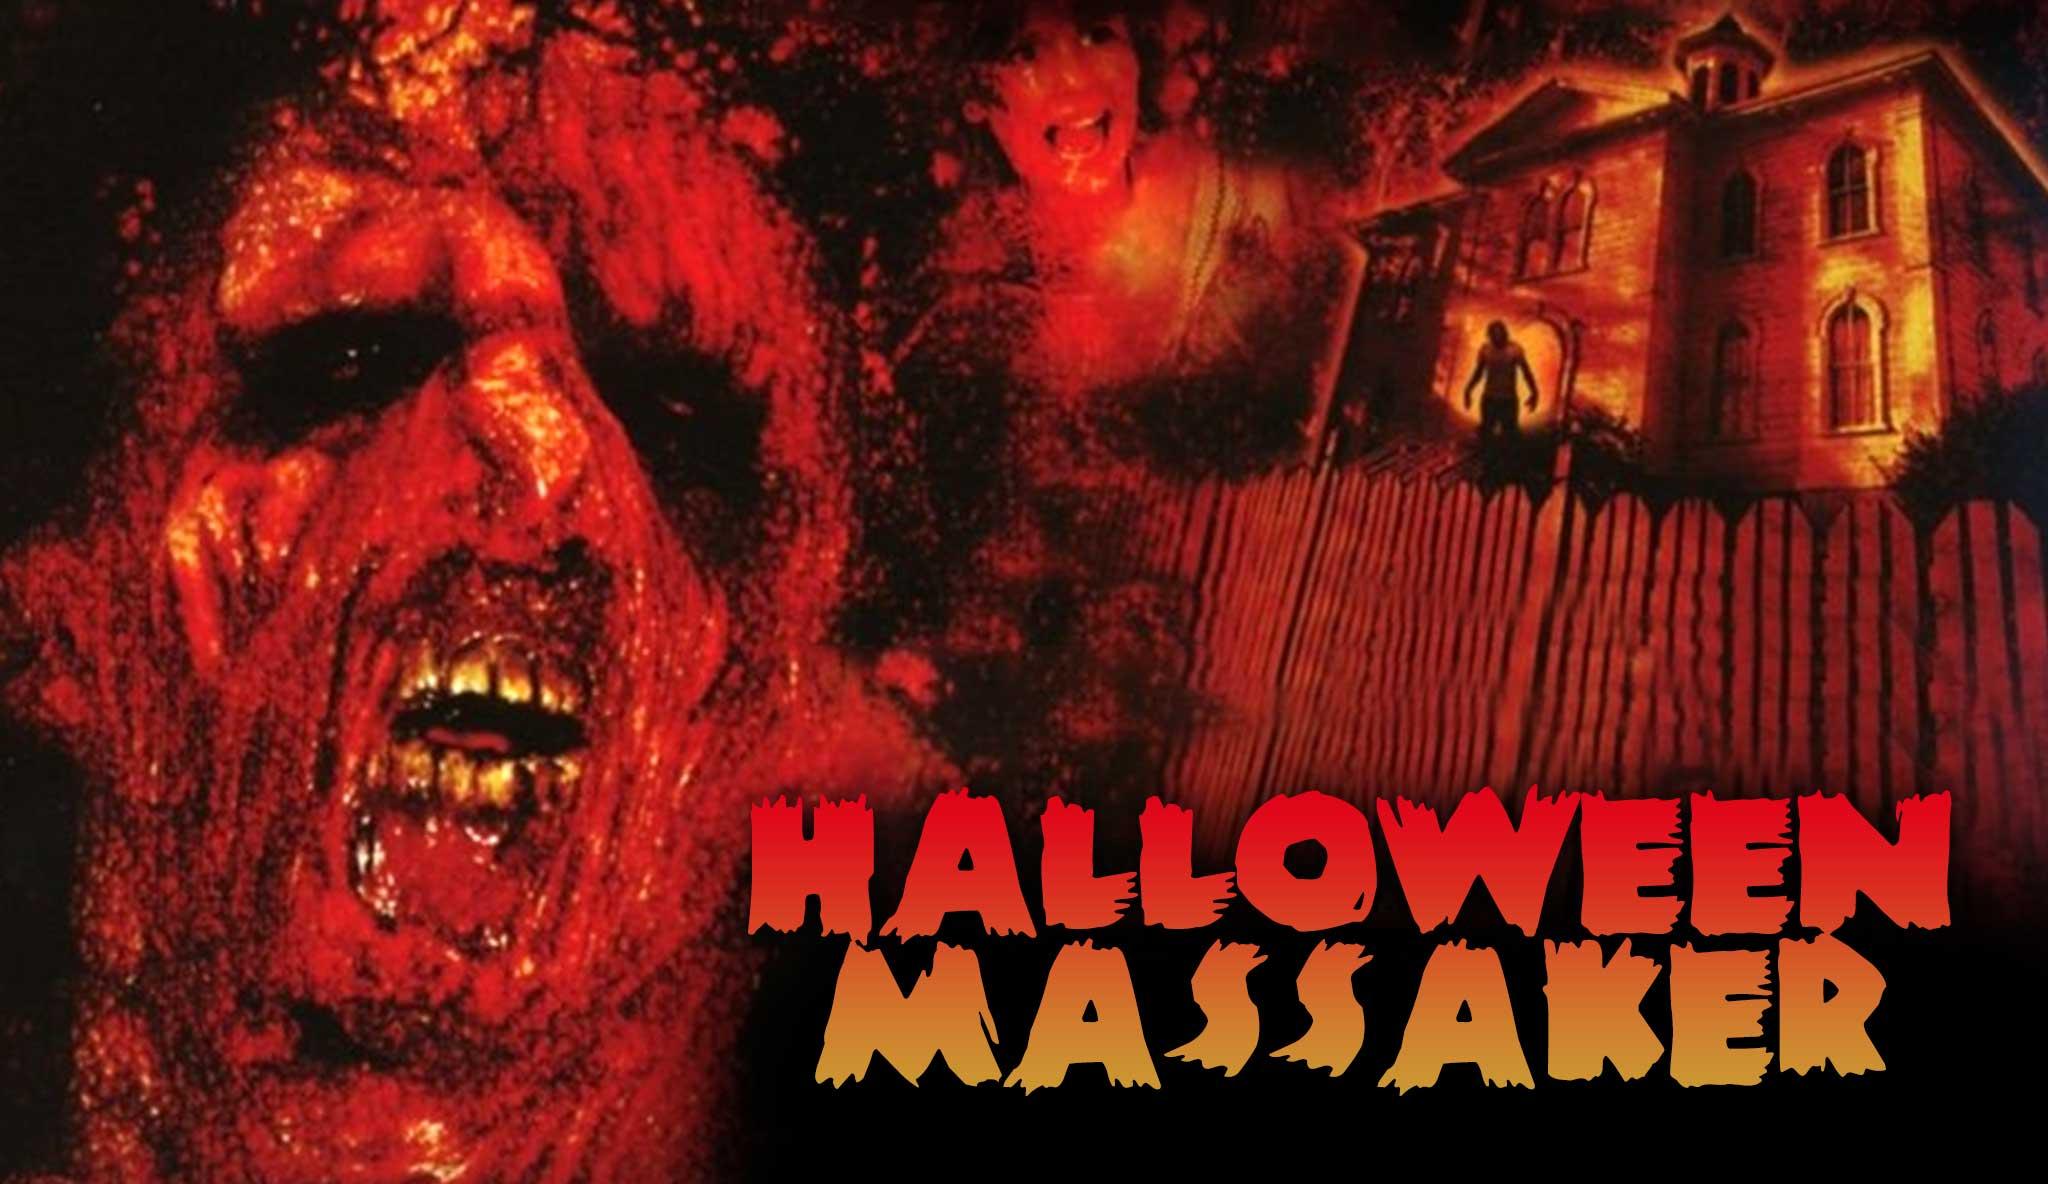 halloween-massaker\header.jpg